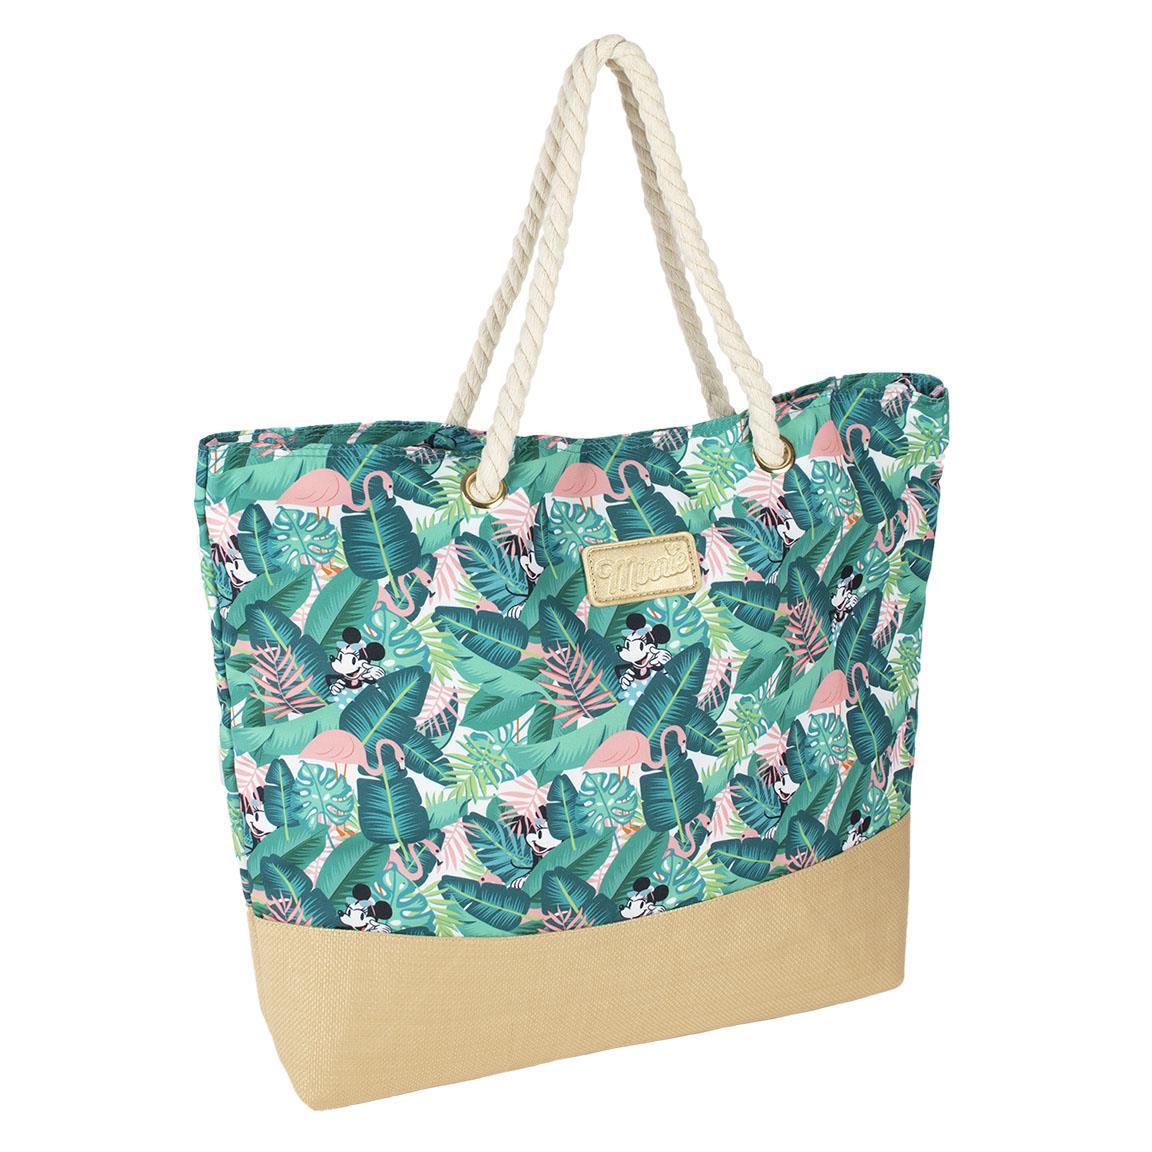 Minnie Large Summer bag